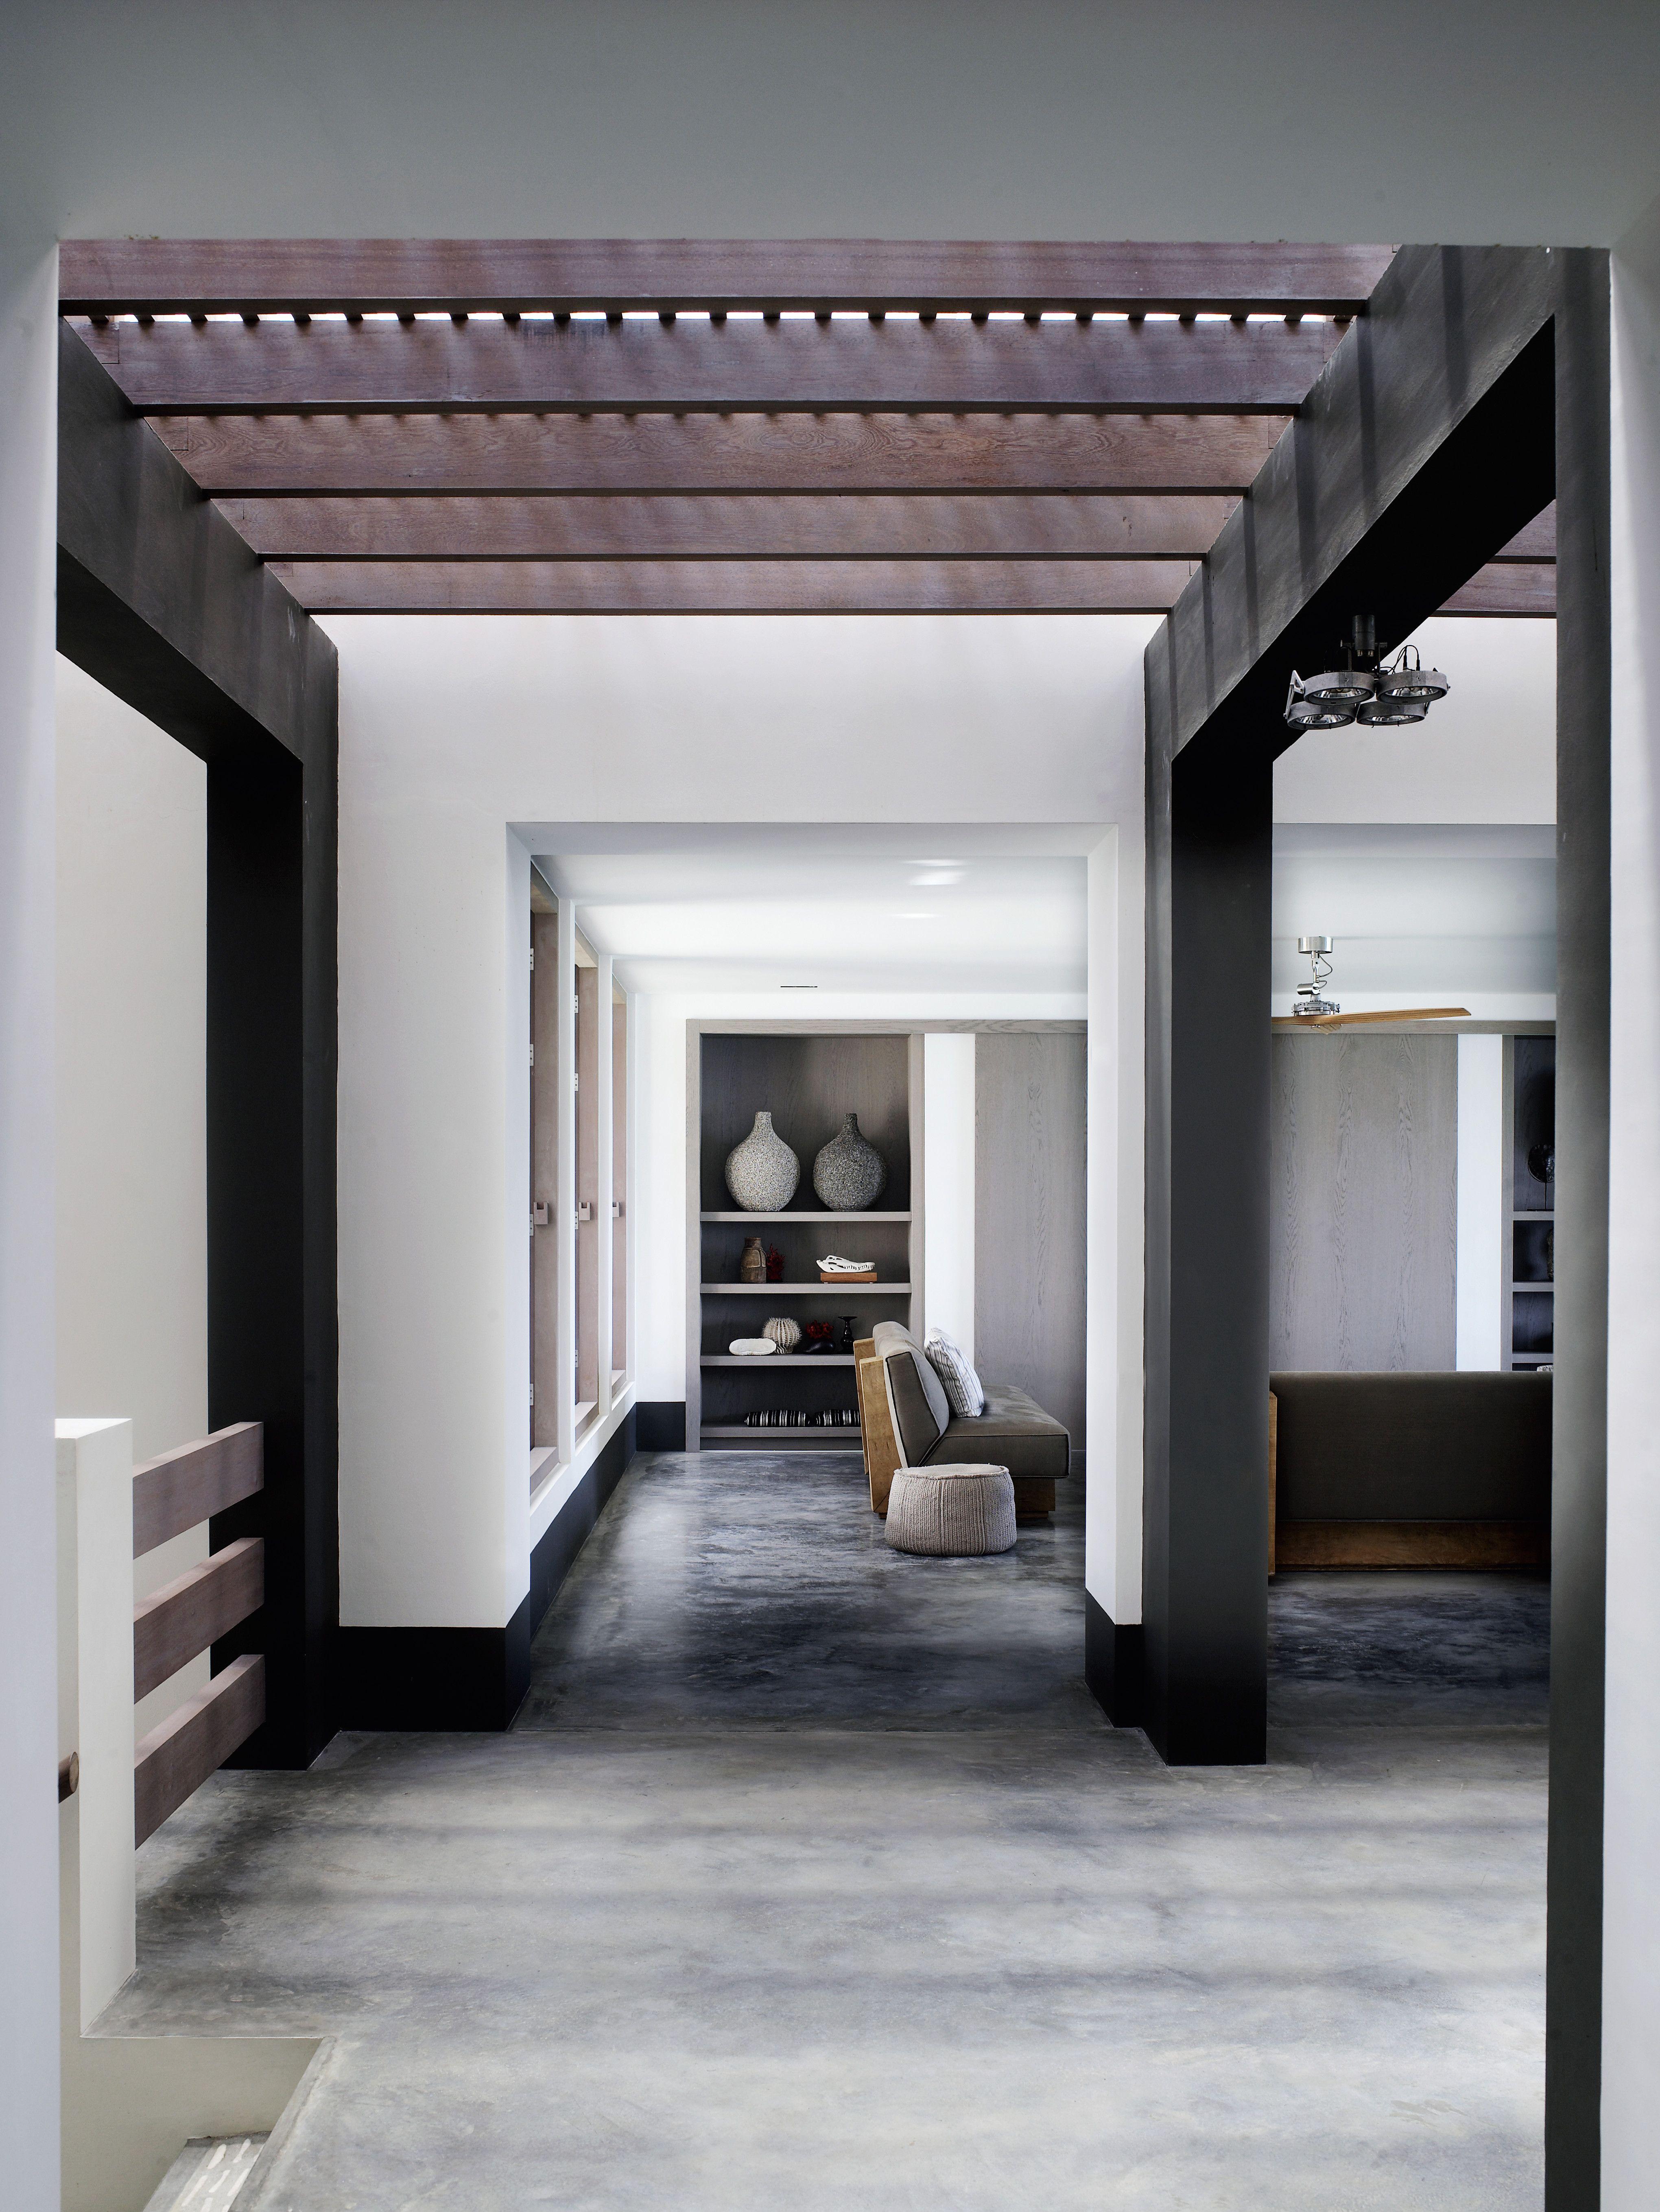 Concrete Interior | Piet Boon | Concrete Design | Inspiration | Home |  Interior Design |